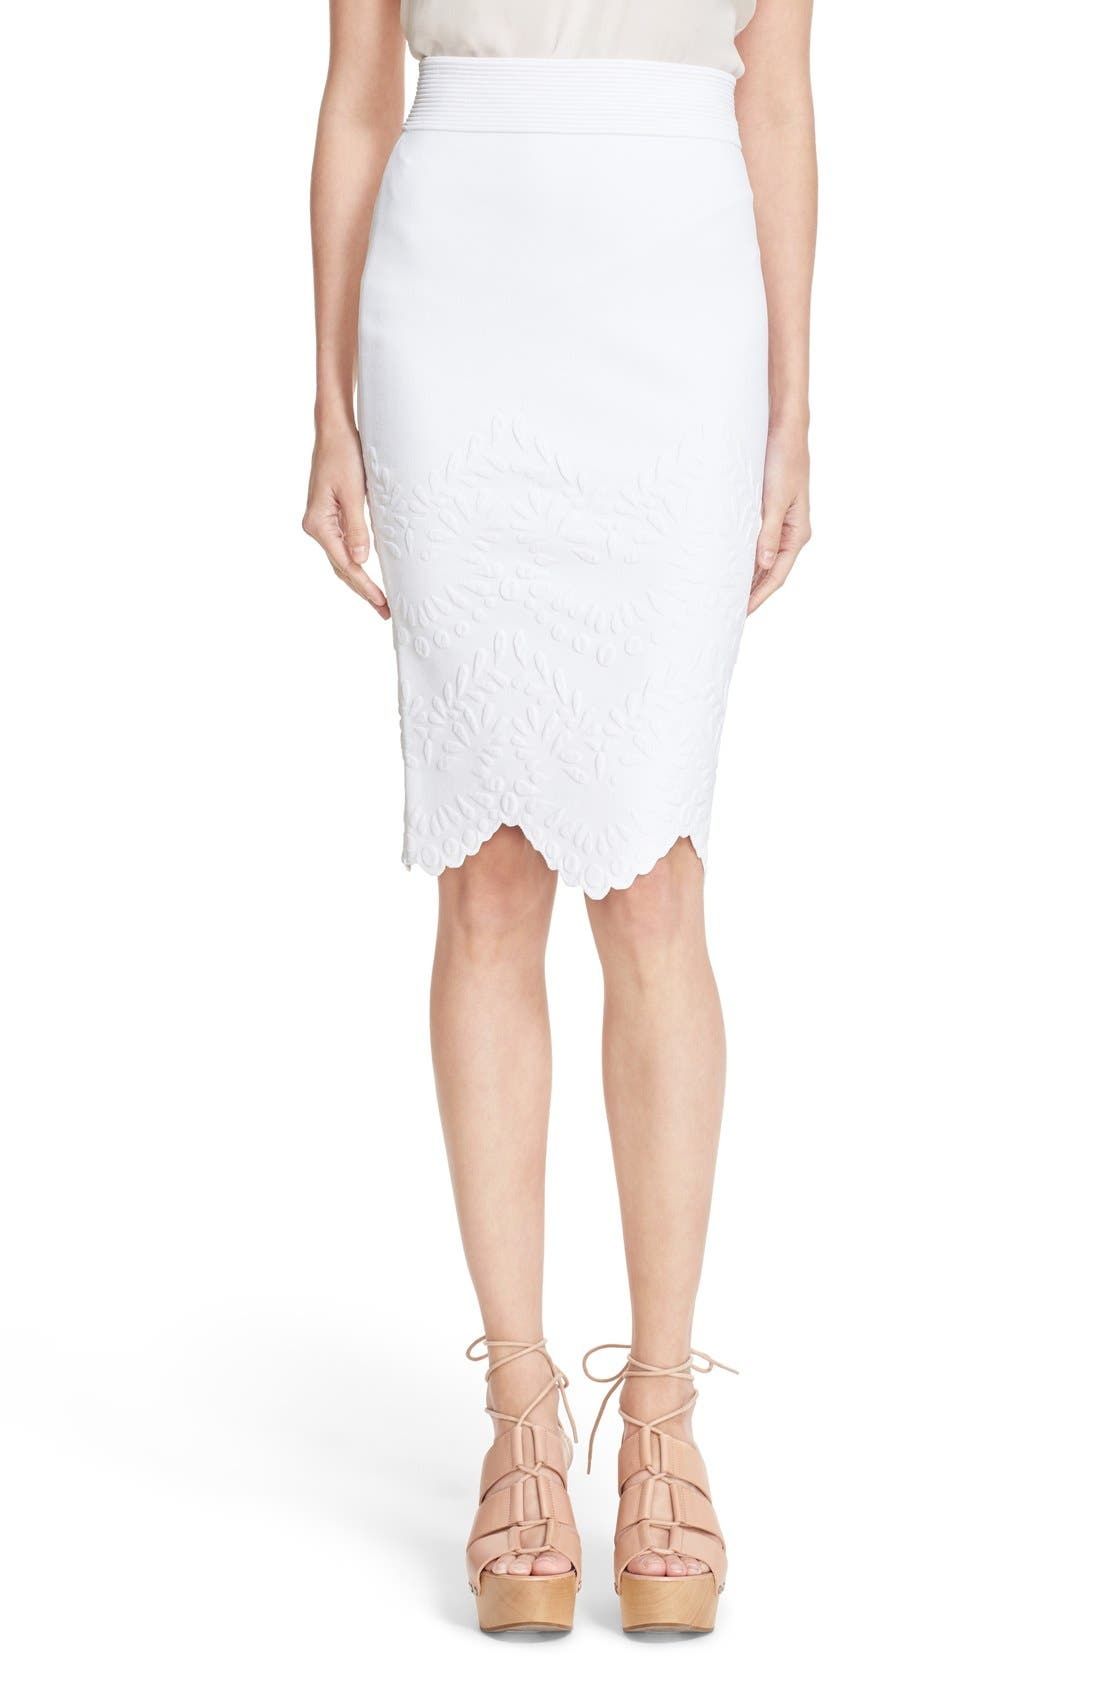 Alternate Image 1 Selected - Alexander McQueen Embossed Jacquard Knit Pencil Skirt